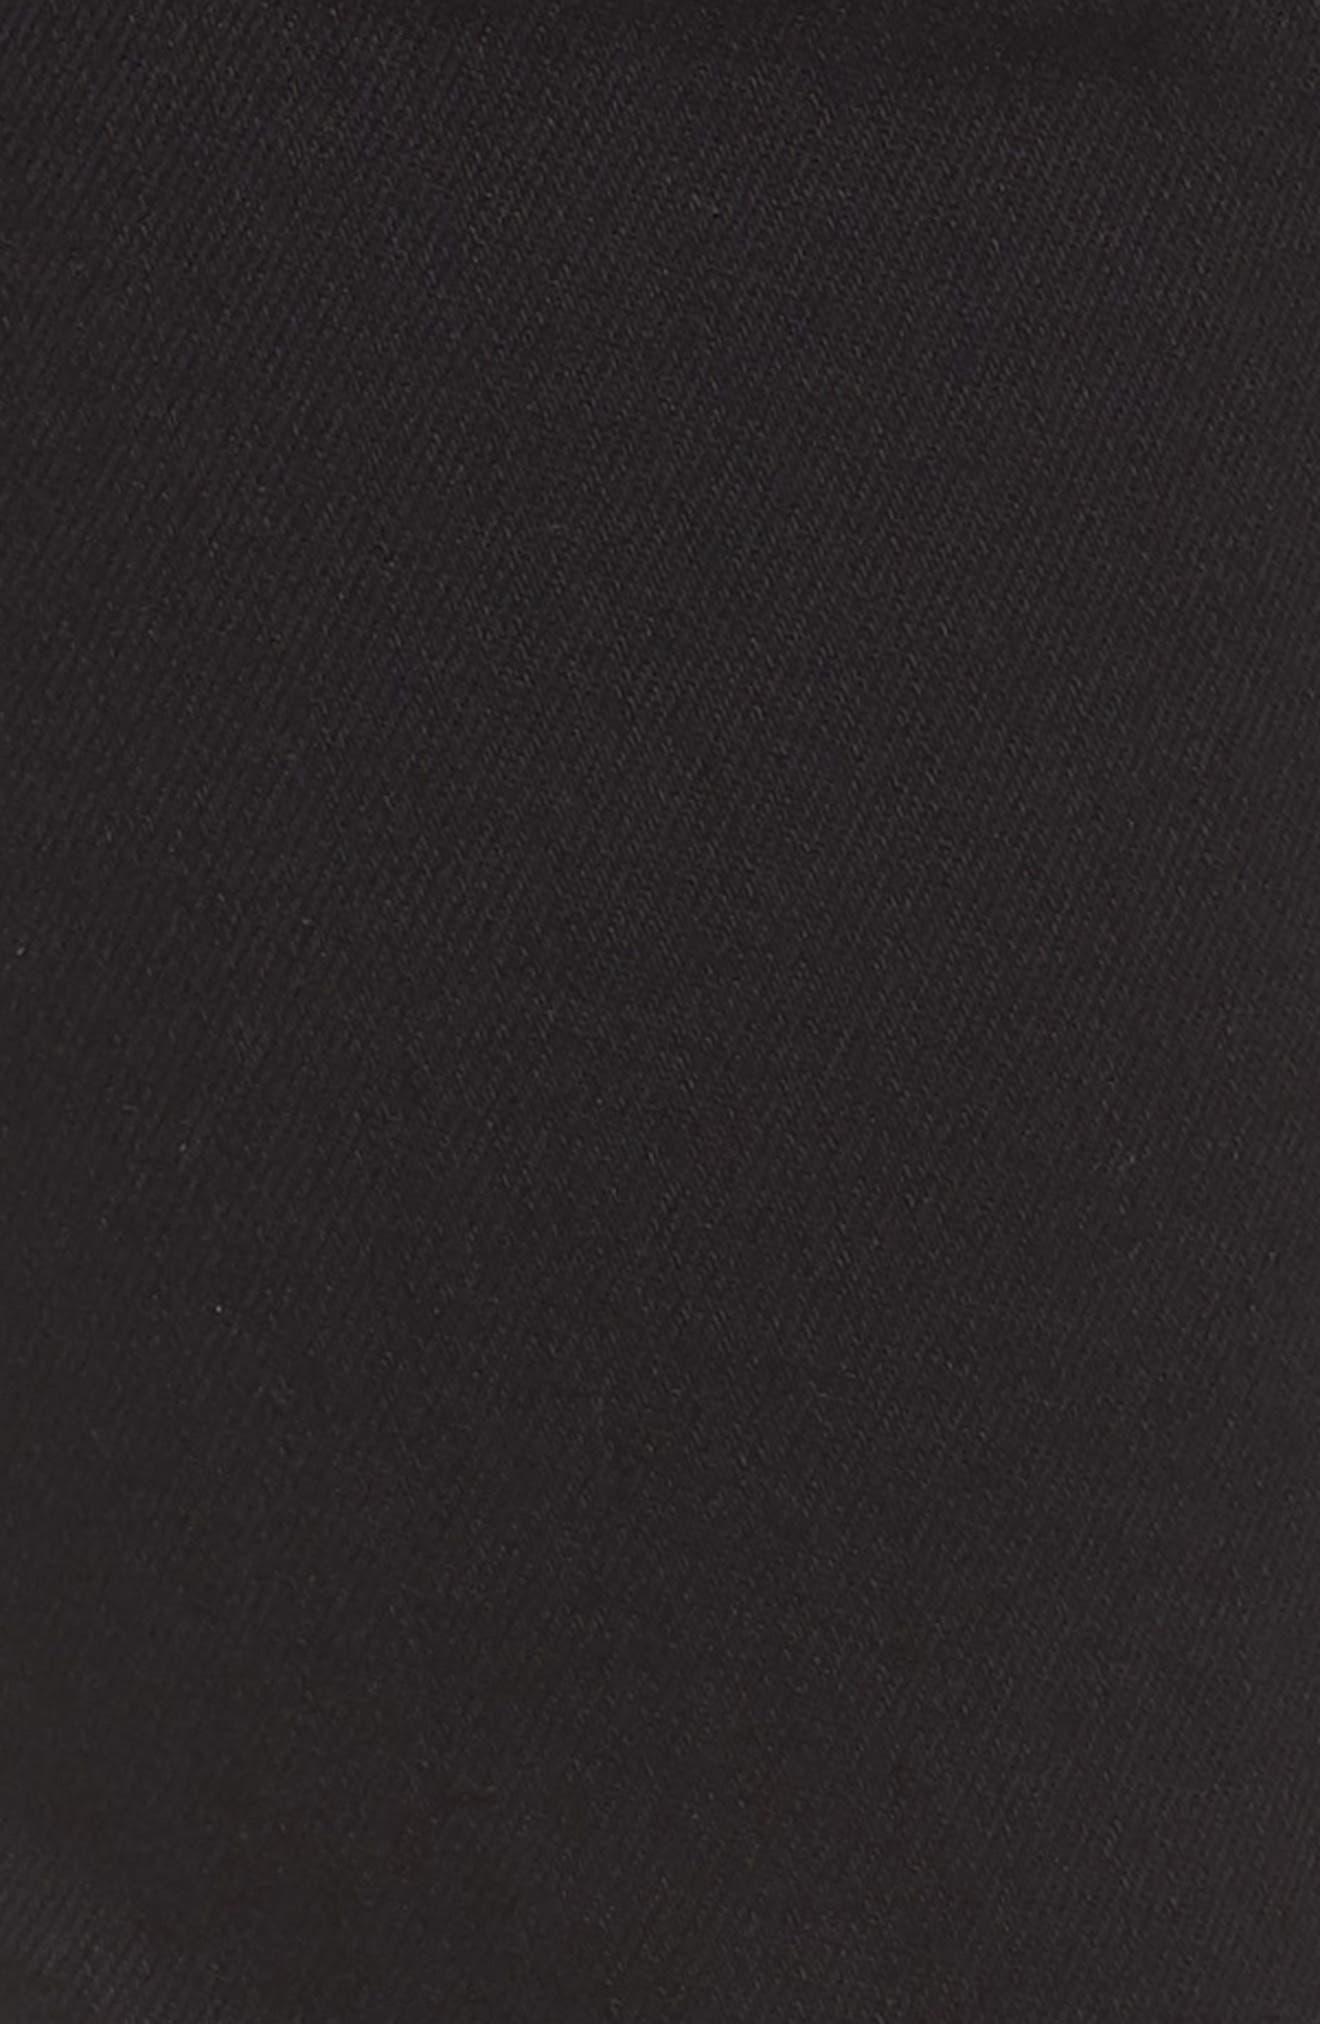 Karly Black Nolita Roll Cuff Bermuda Shorts,                             Alternate thumbnail 5, color,